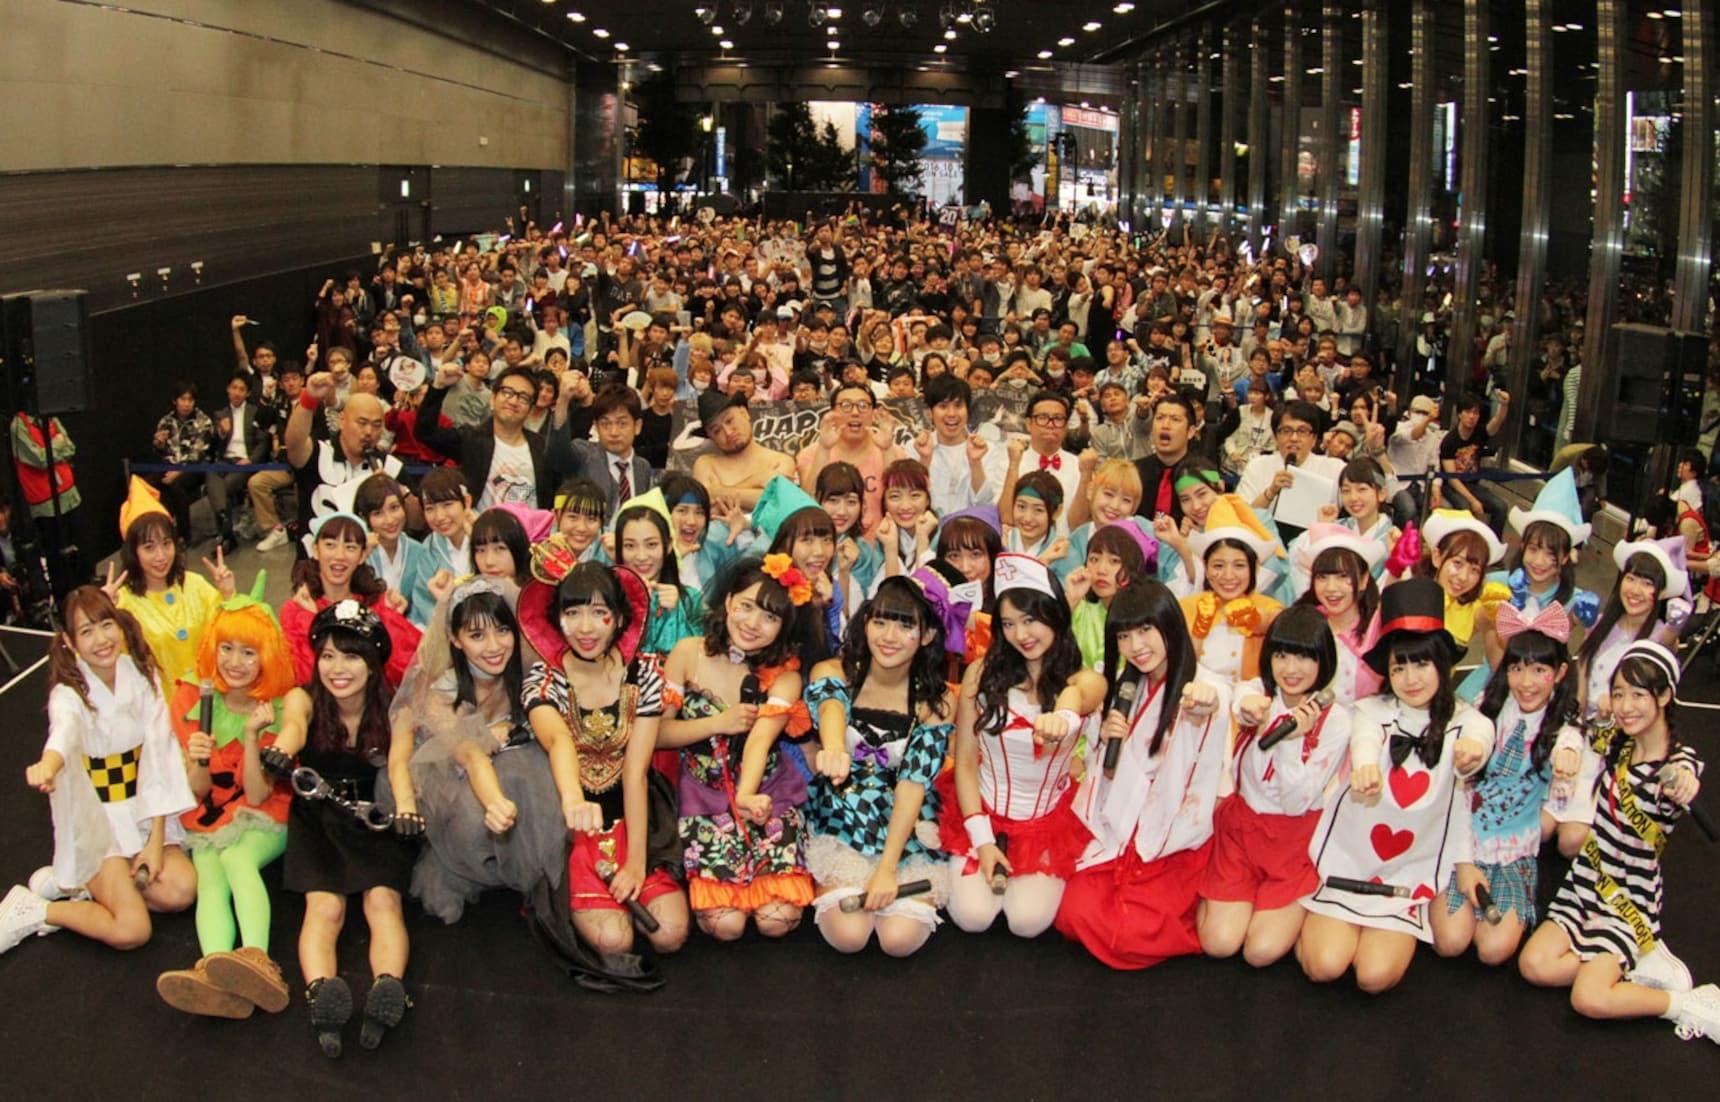 Idols Treat Fans to Free Concert in Akihabara